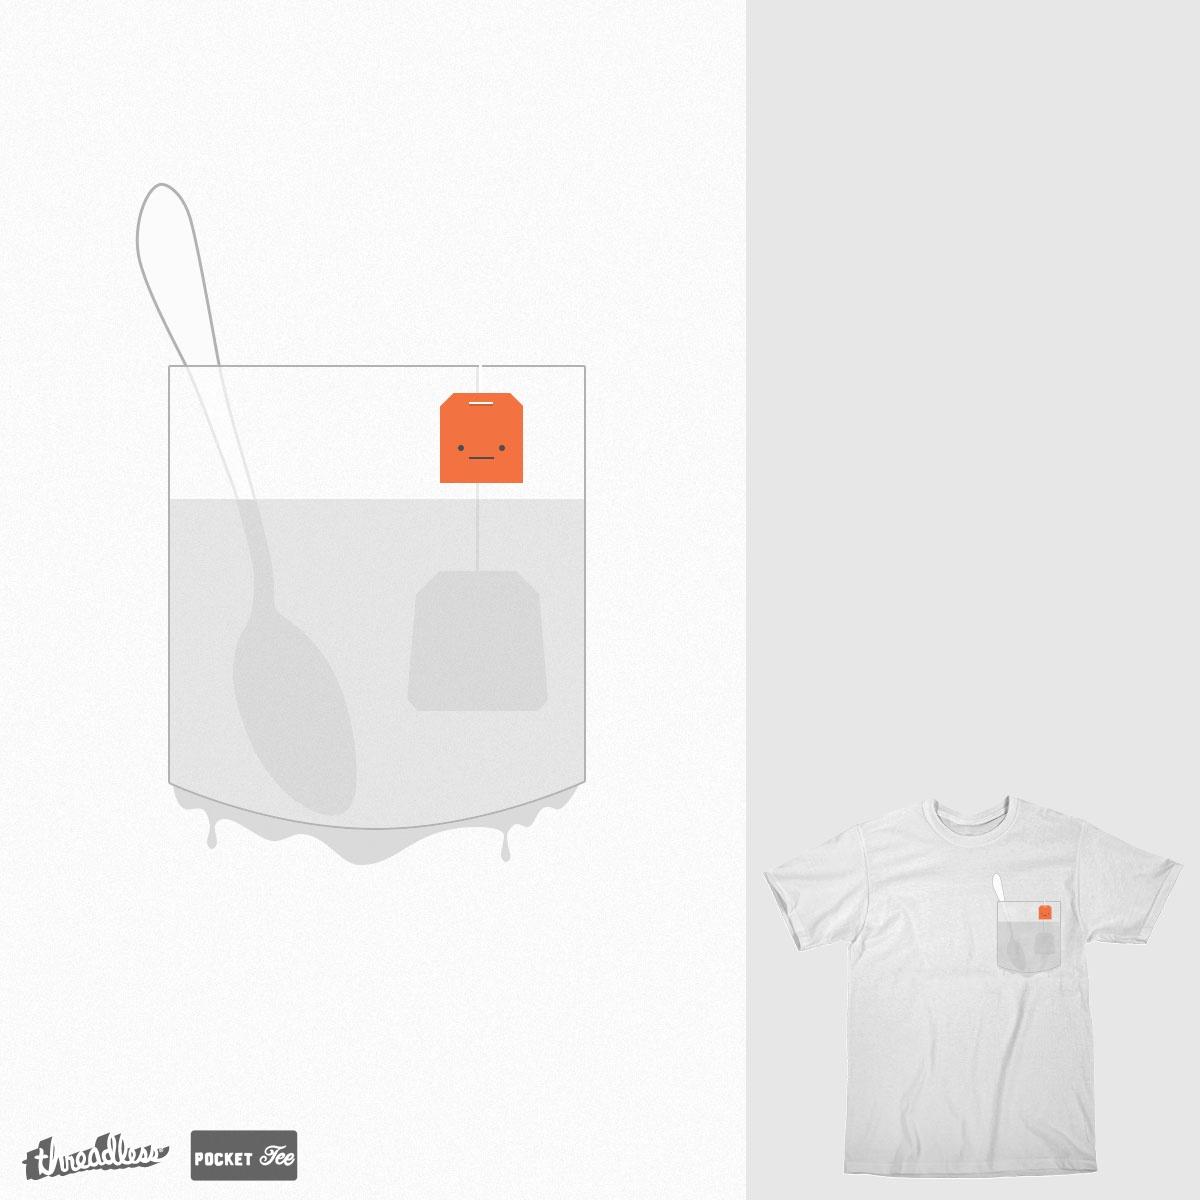 pocket with tea by Kot Aisberg on Threadless